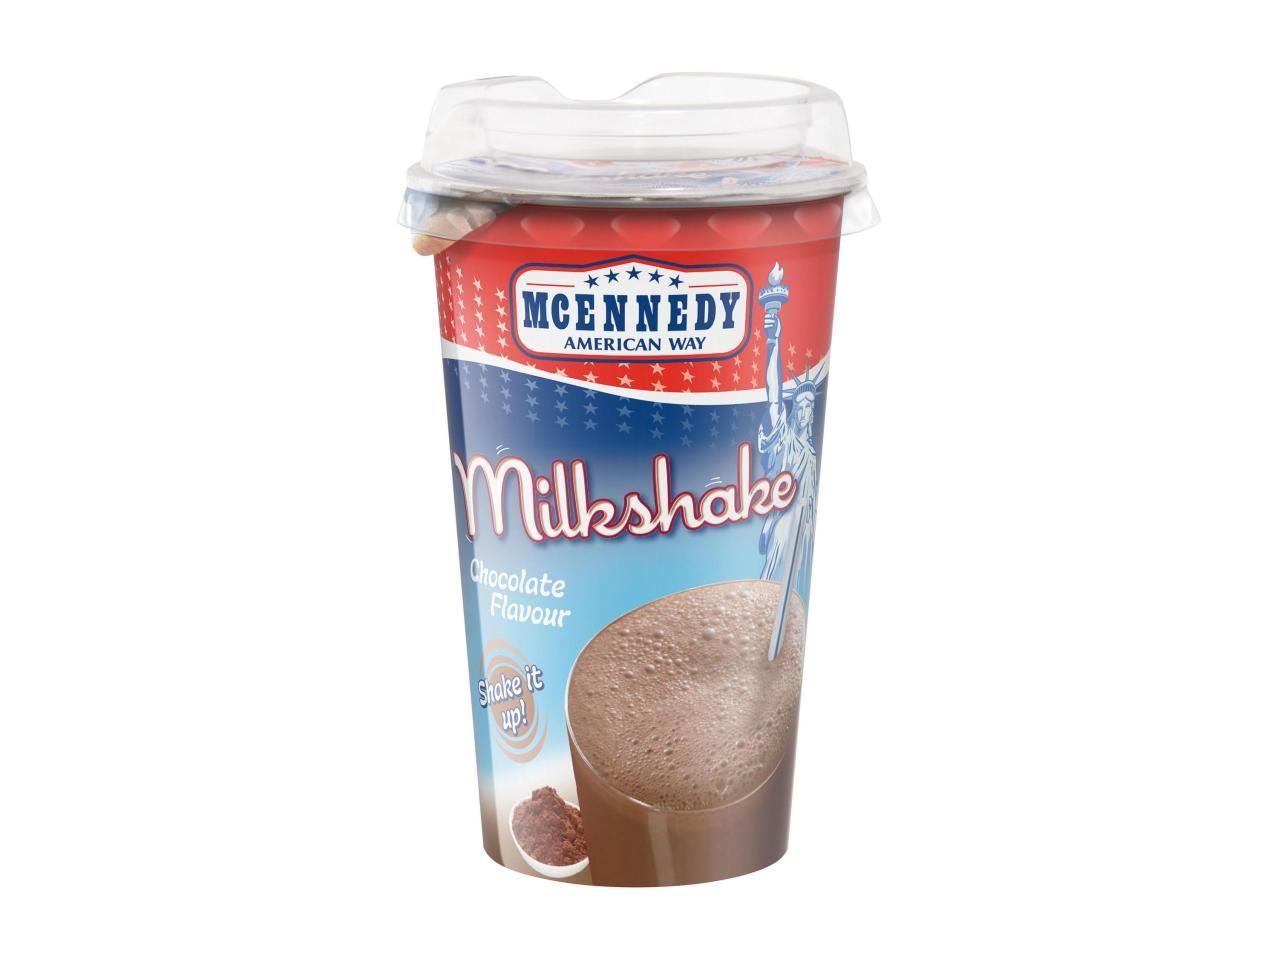 LIDL - Milkshake, 0.69 € [fragola, cioccolato] - dal 26.06 fino a esaurimento scorte #milkshake #cioccolato #fragola